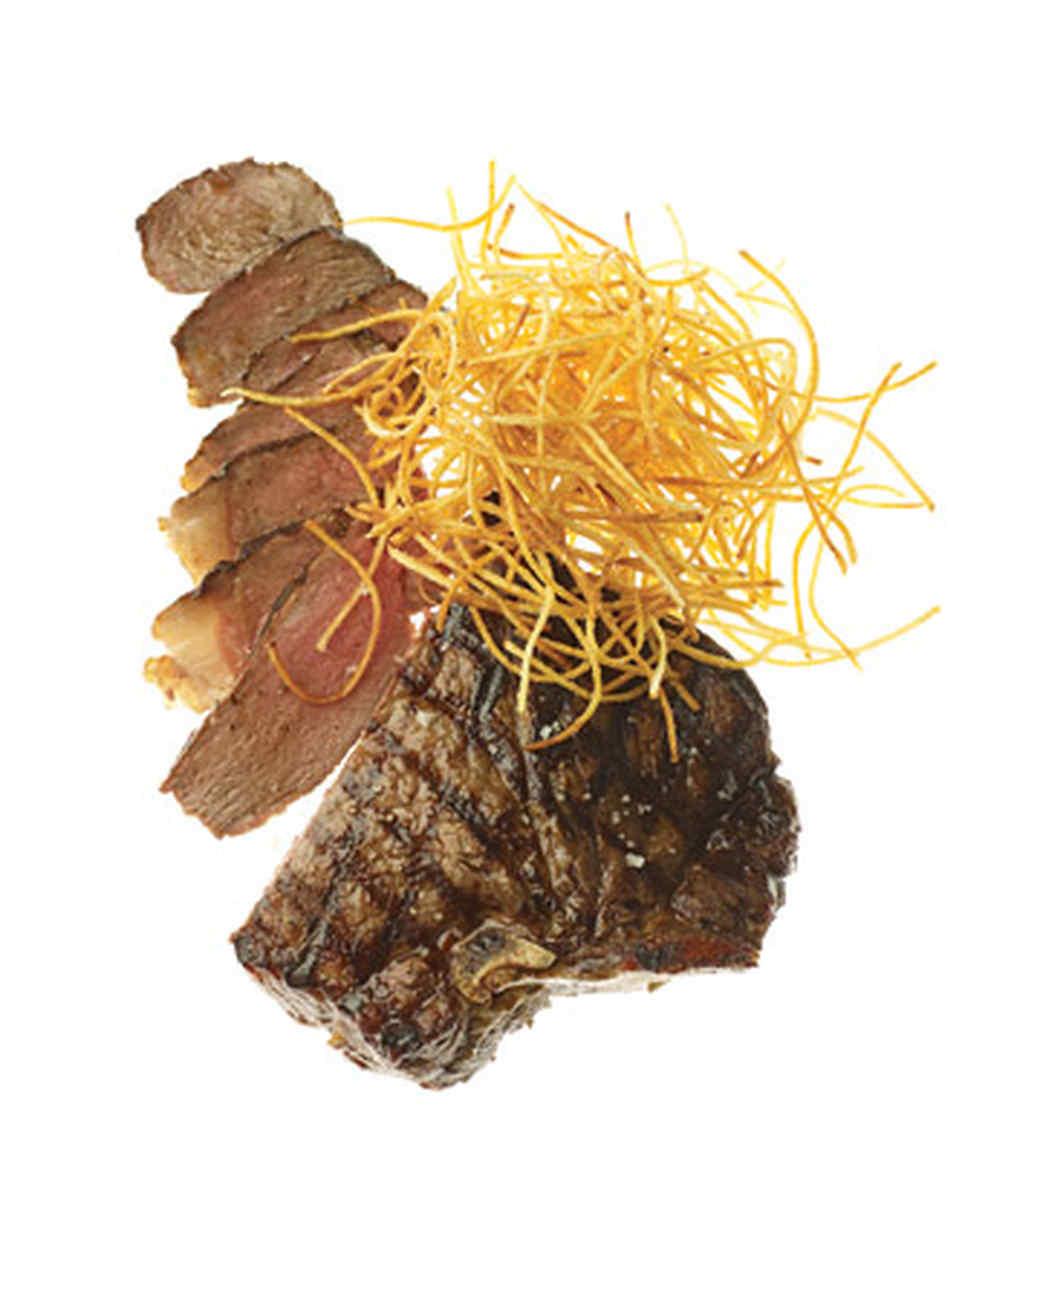 mld103747_1008_steak.jpg